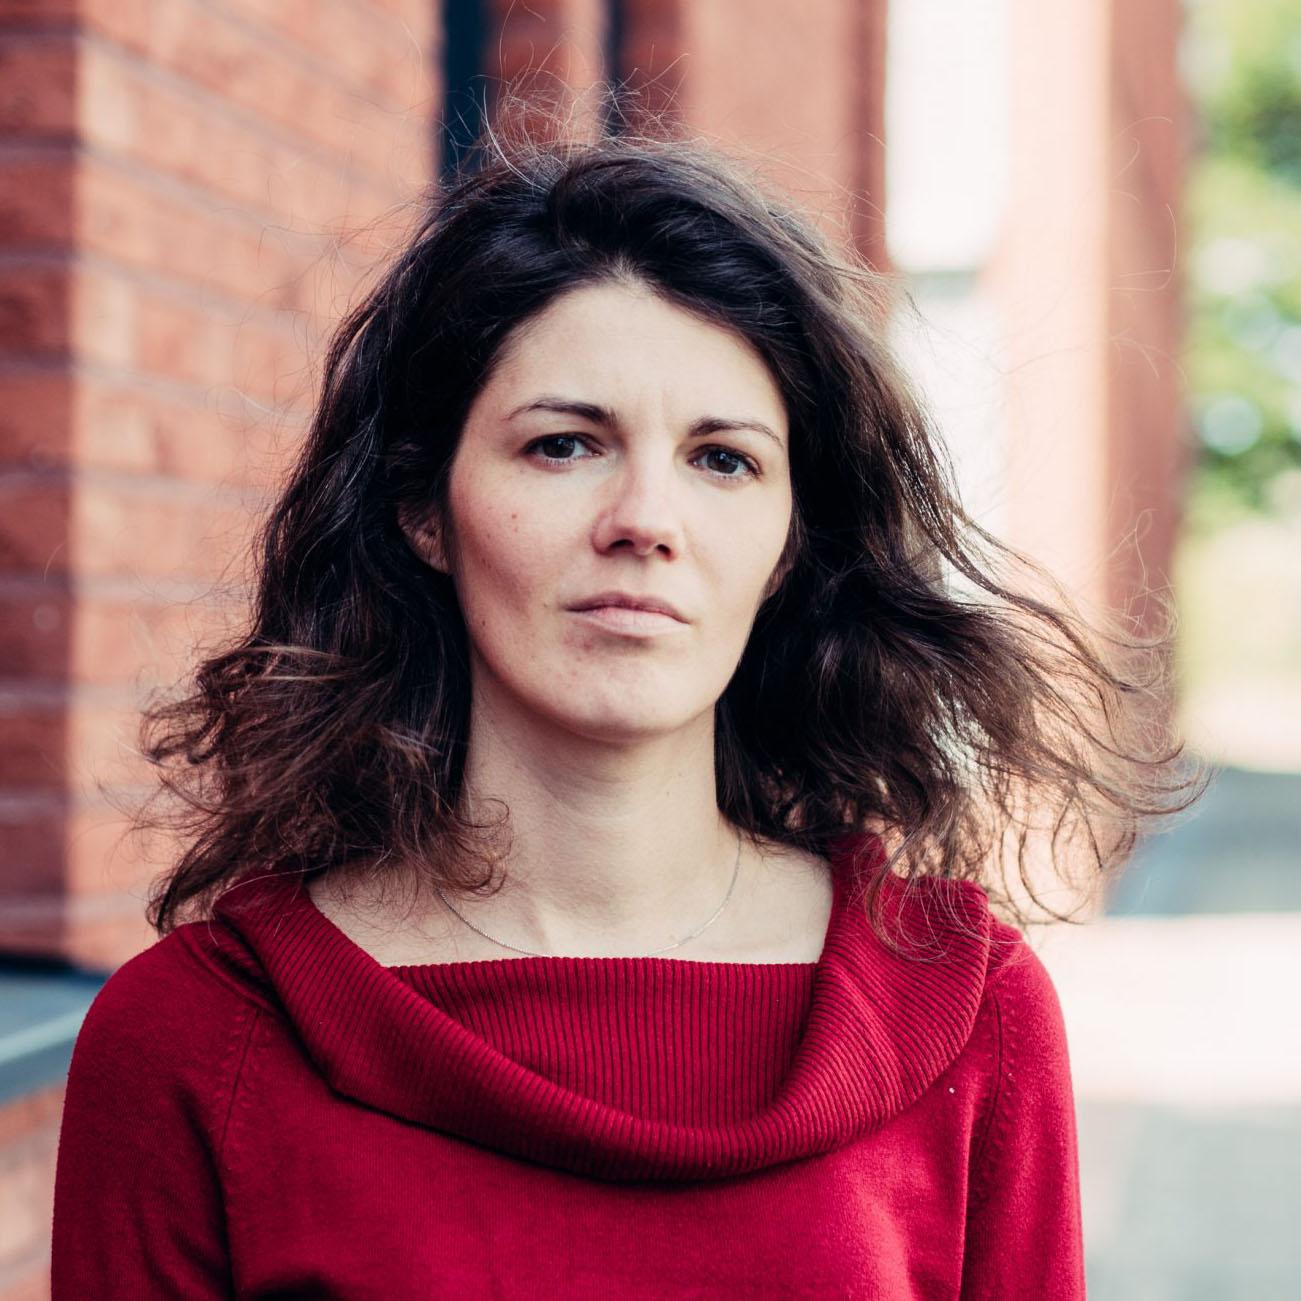 Profilbild Sonja Bastin (Foto: Alexander Heil)